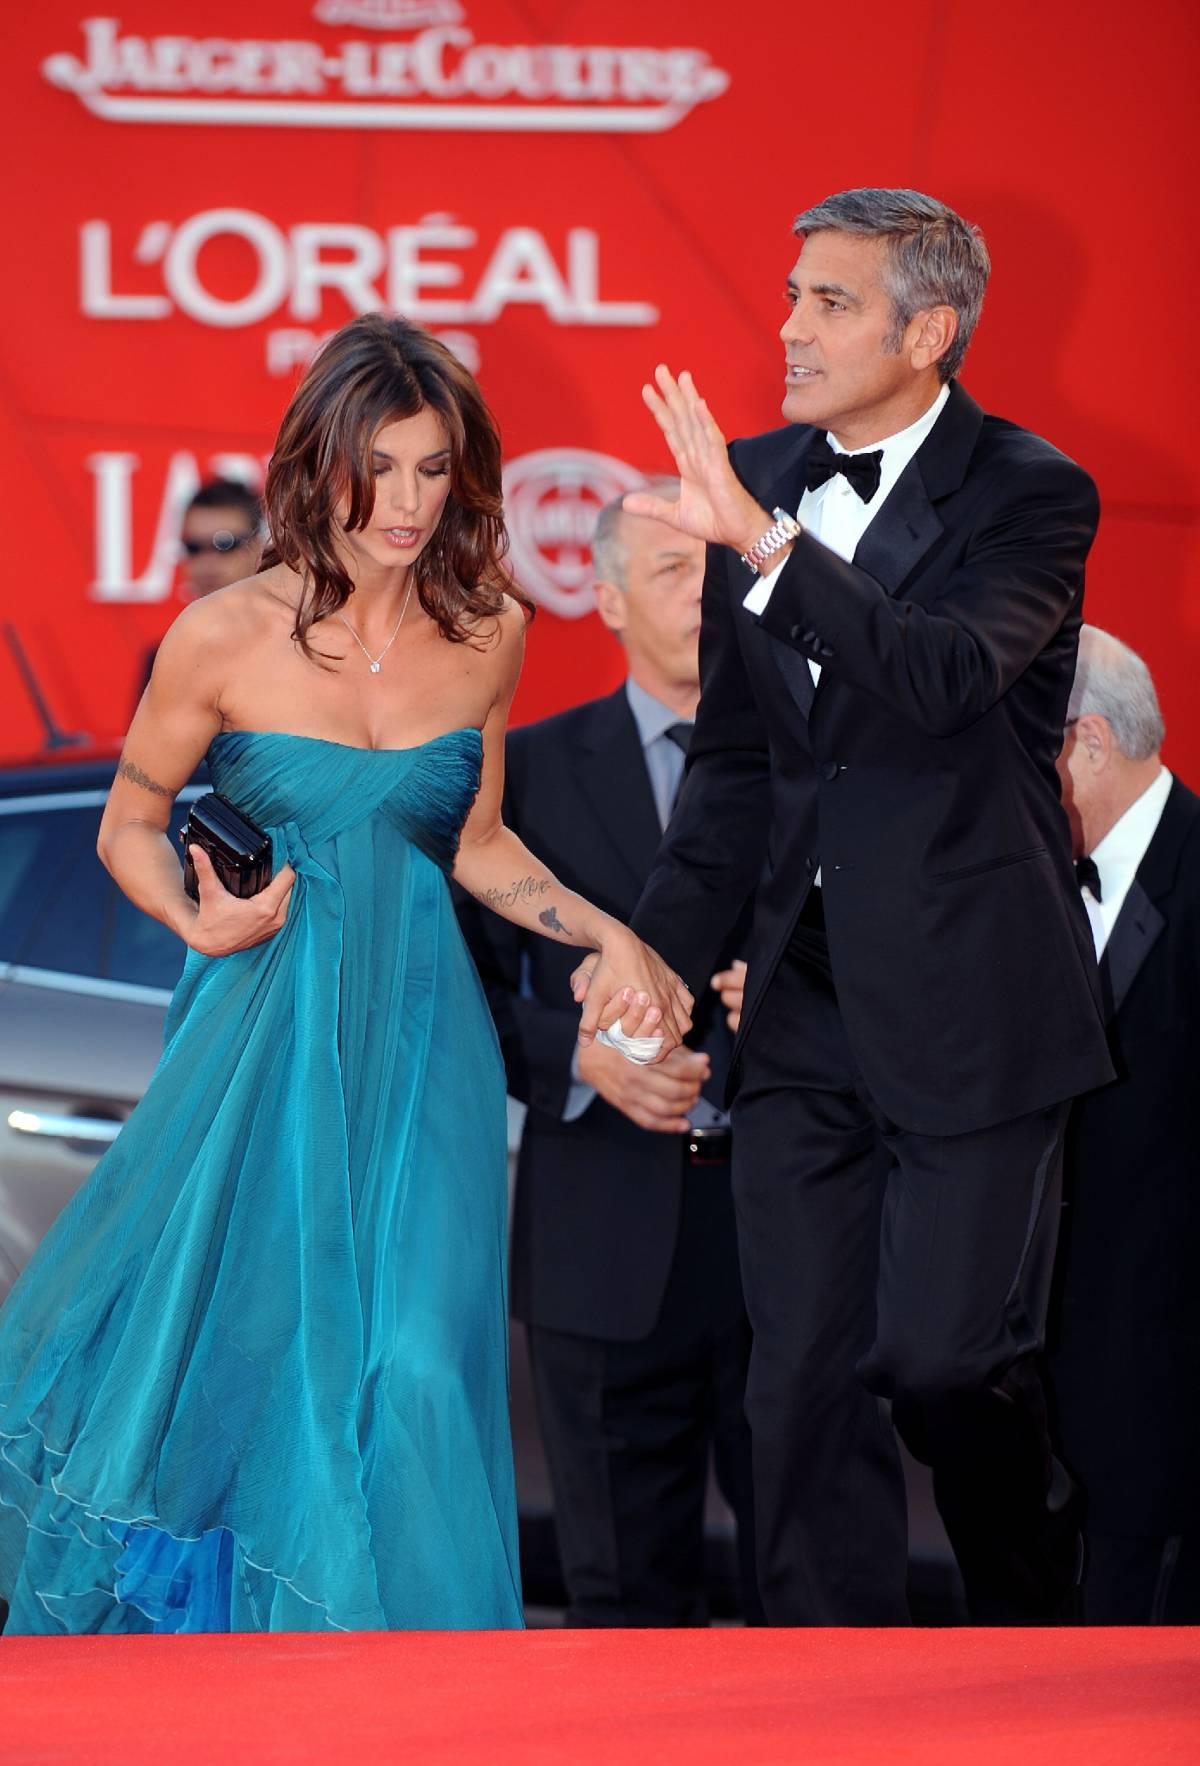 Clooney al Lido con la Canalis  Ma niente baci per i fotografi